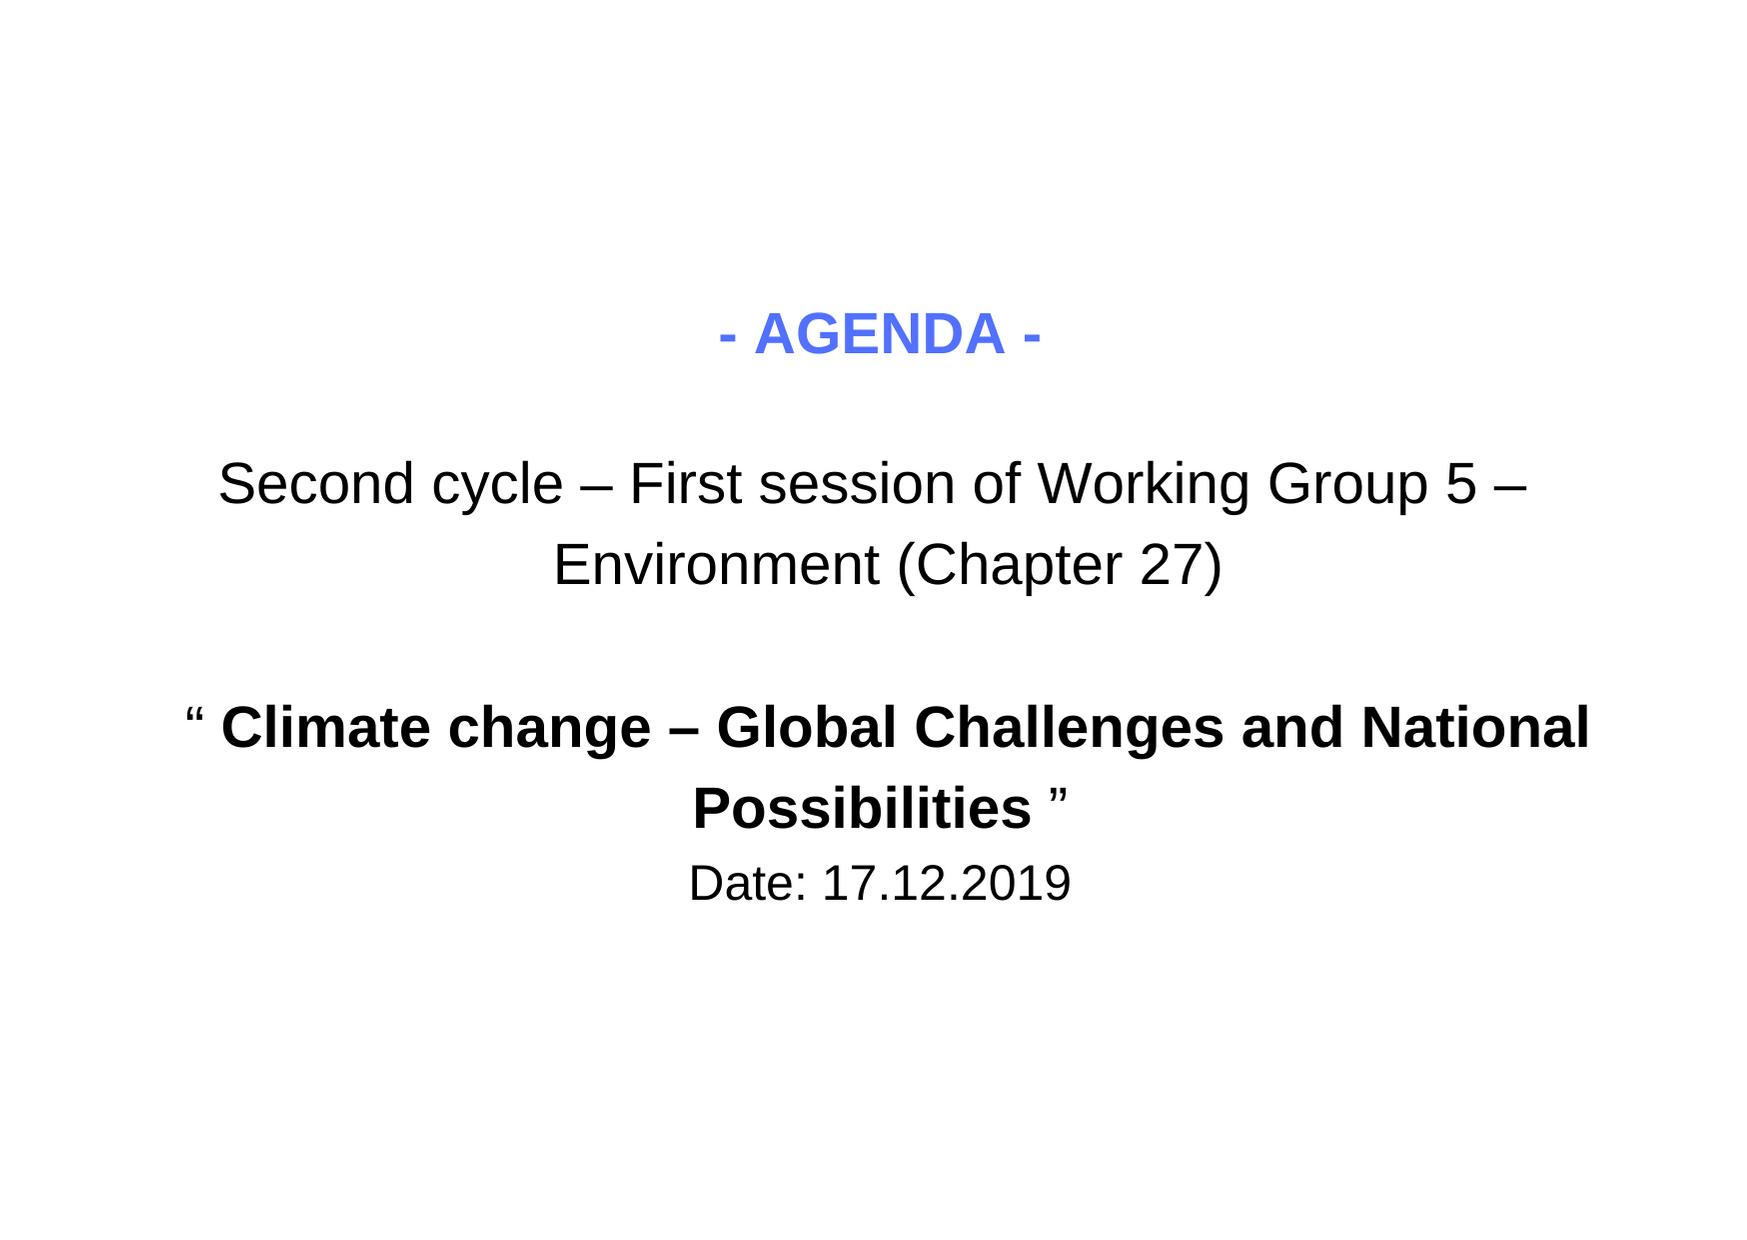 Agenda WG5 1 session 2 cycle